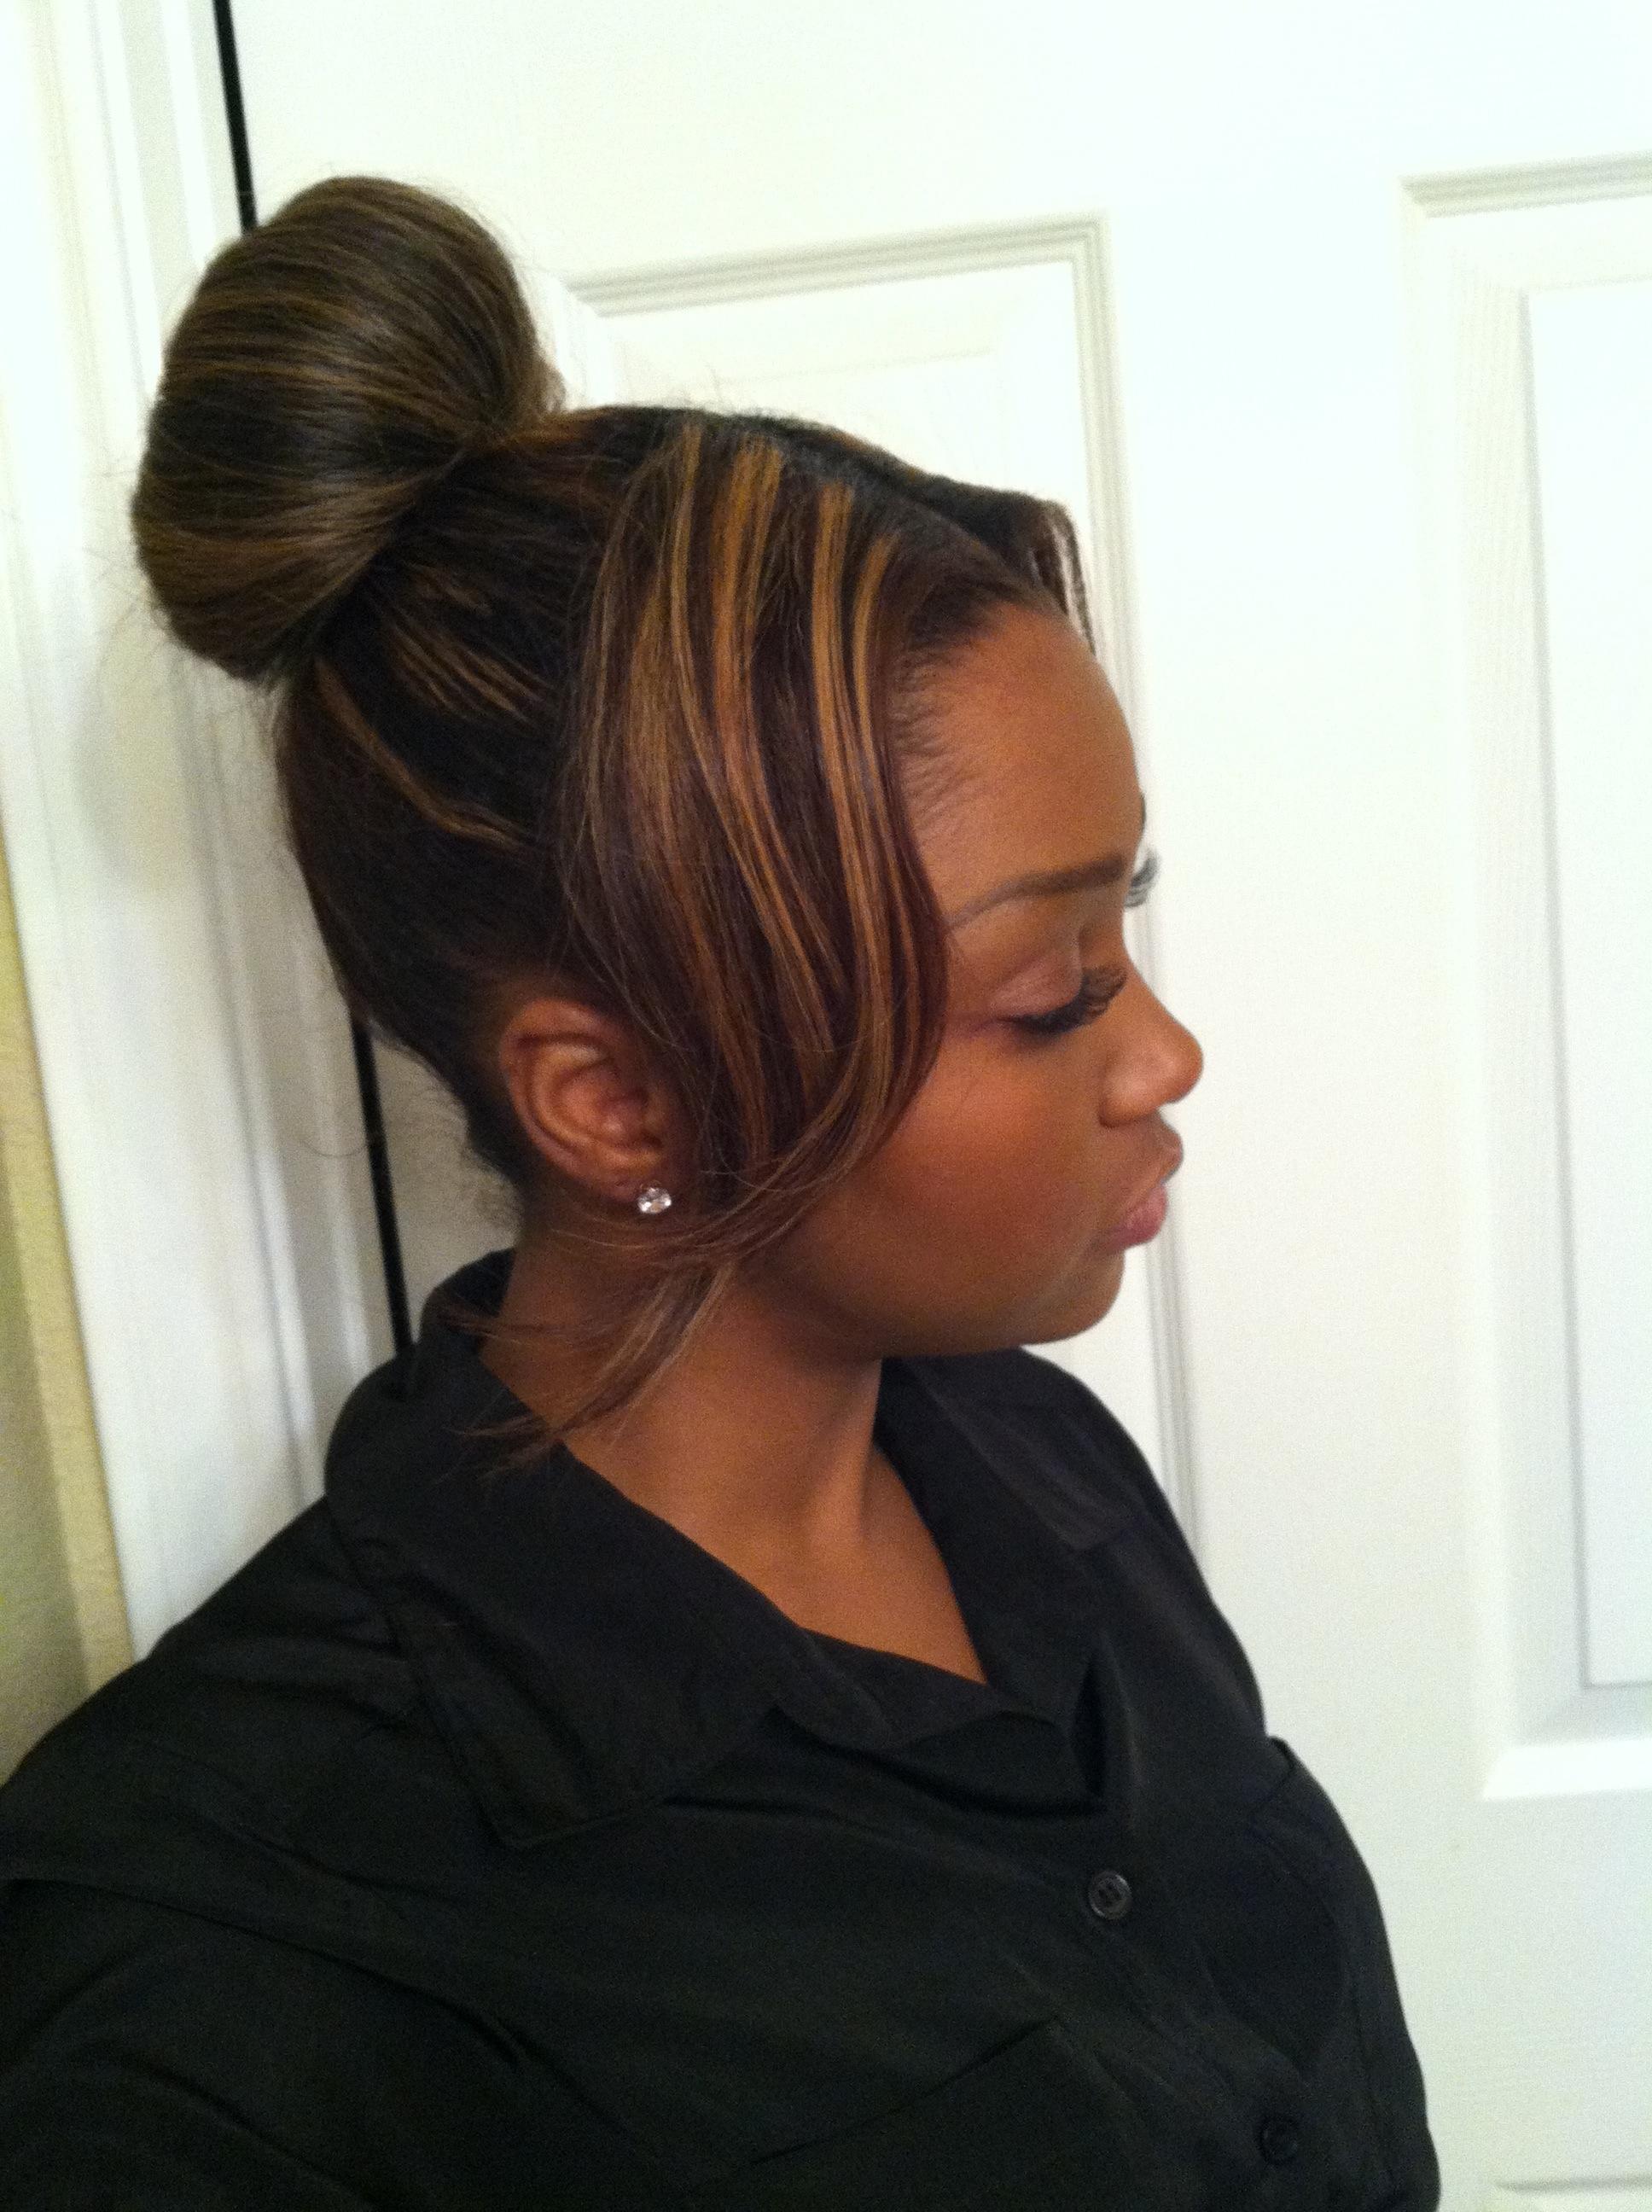 Timeless Amp Fashionable Hair Idea For The Woman On The Go